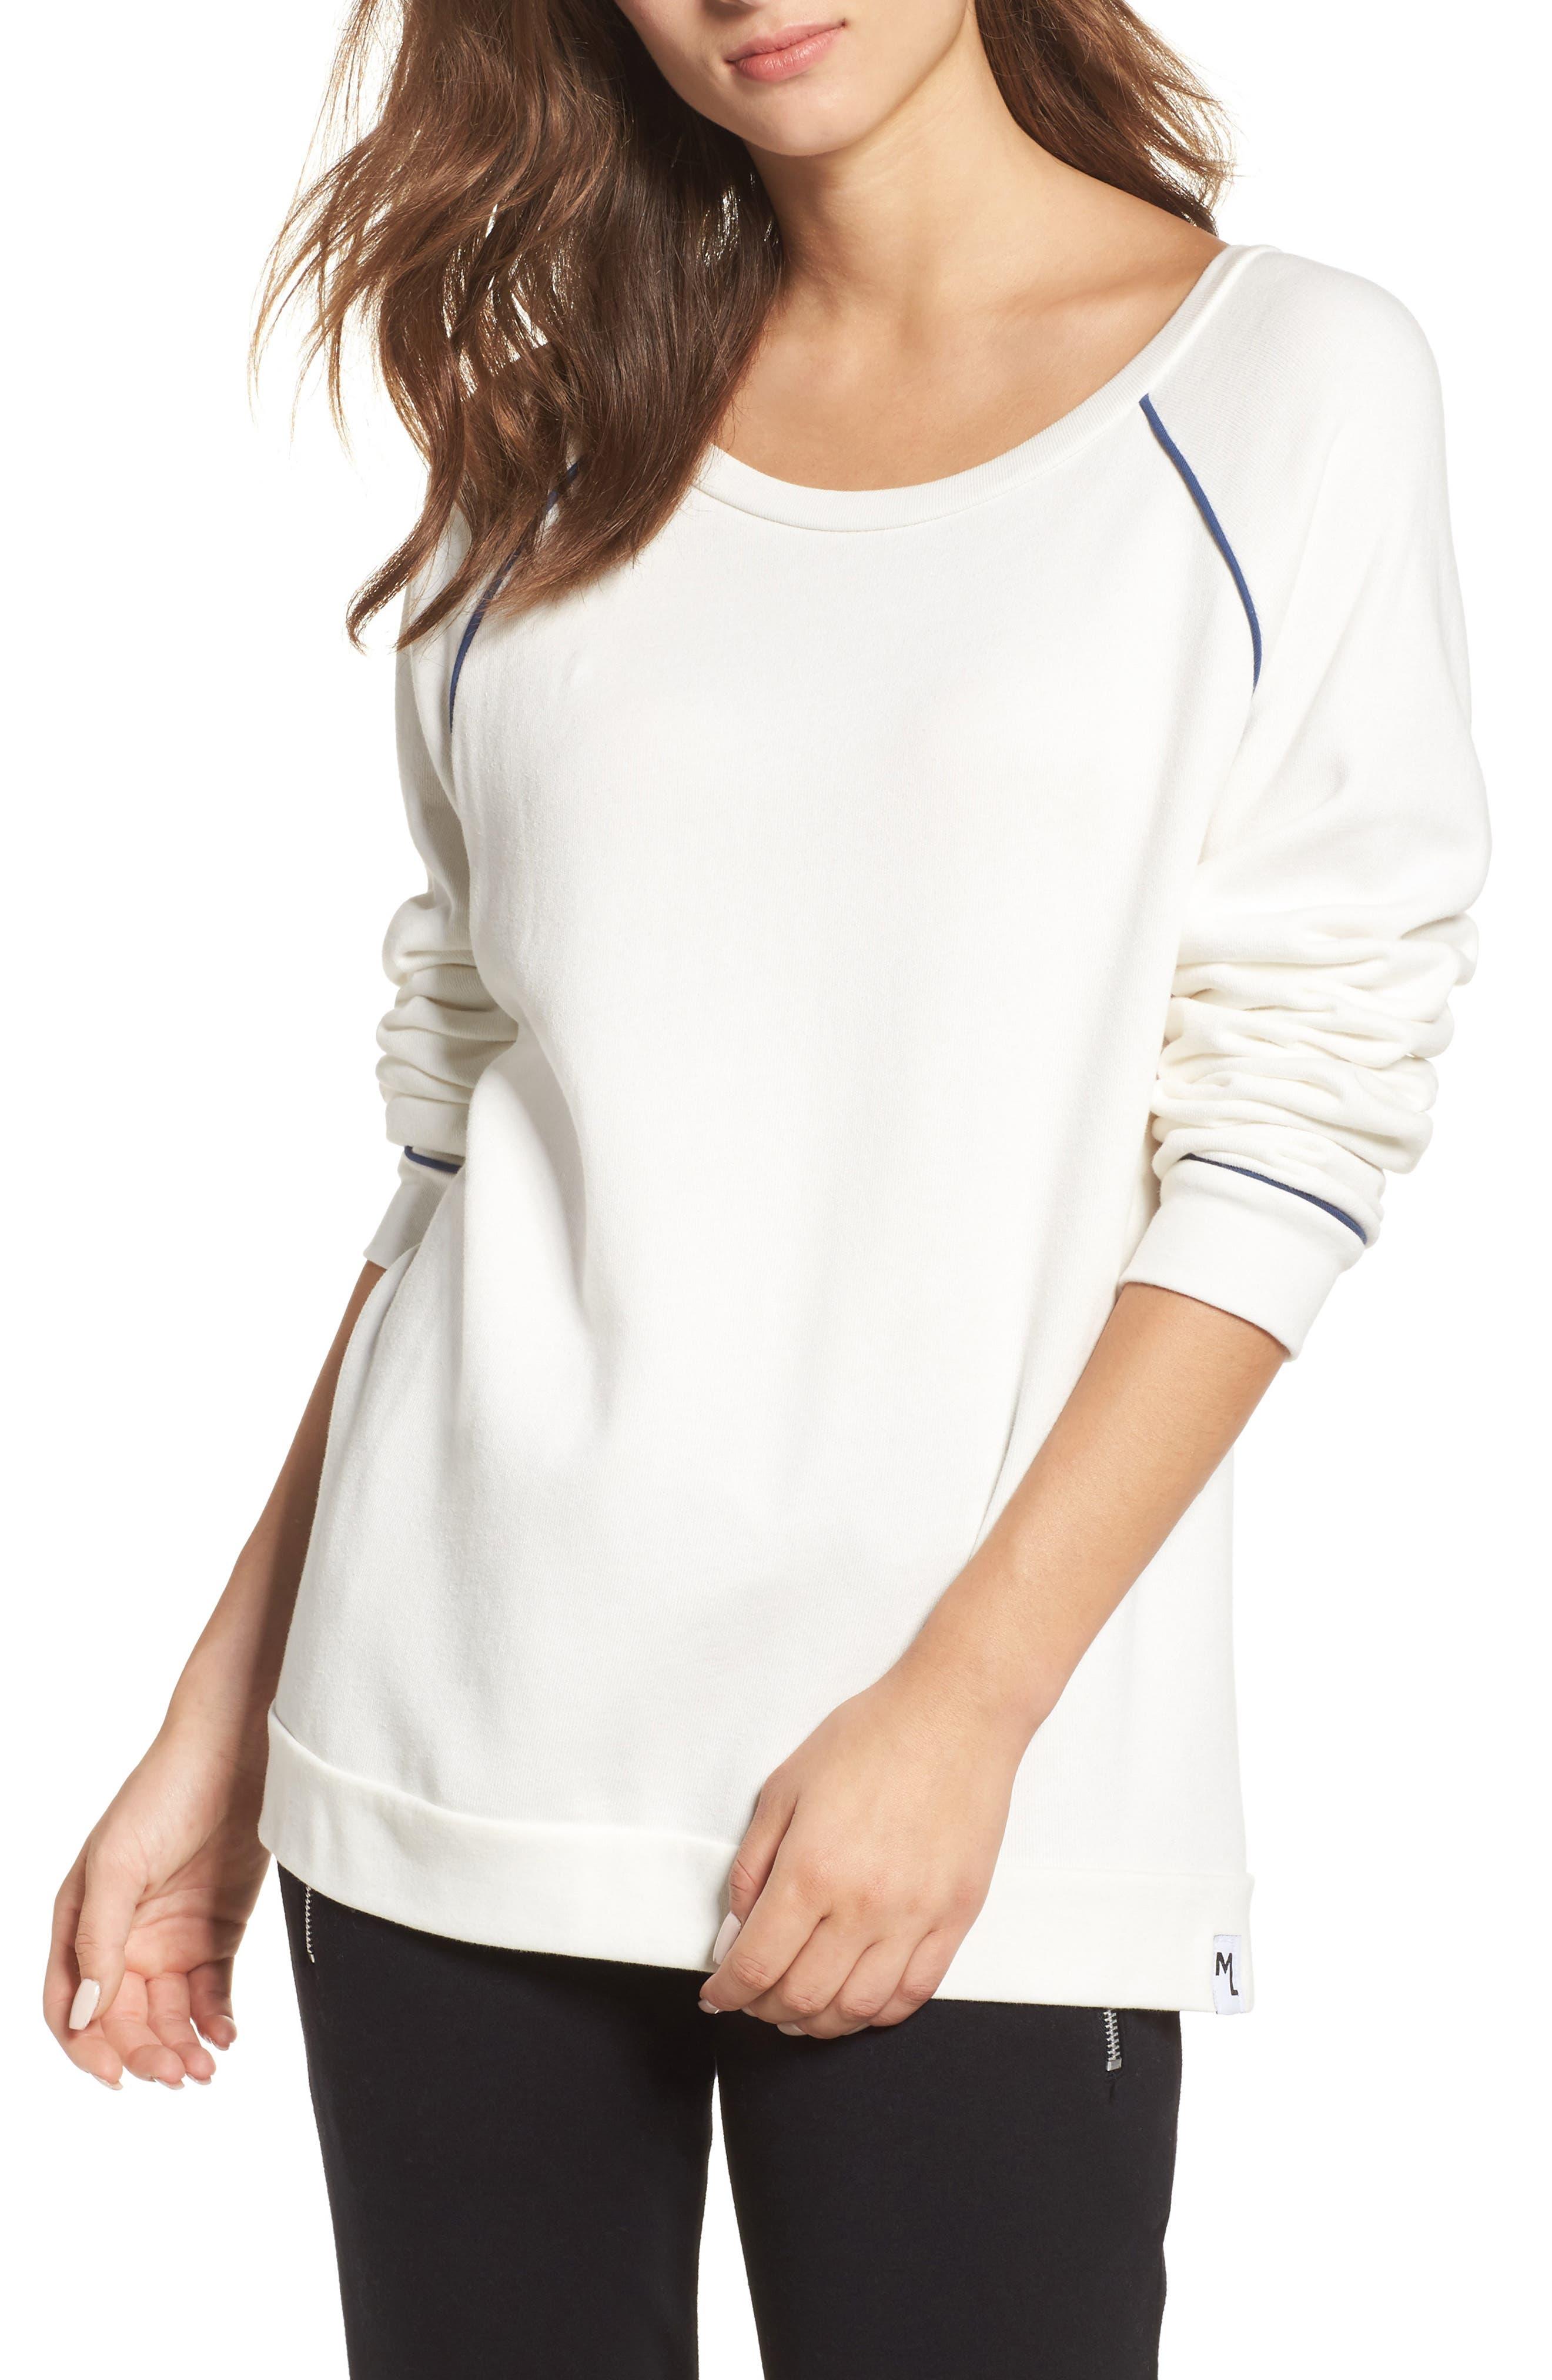 Juniper Lounge Sweatshirt,                             Main thumbnail 1, color,                             Milk/ Ink Blue